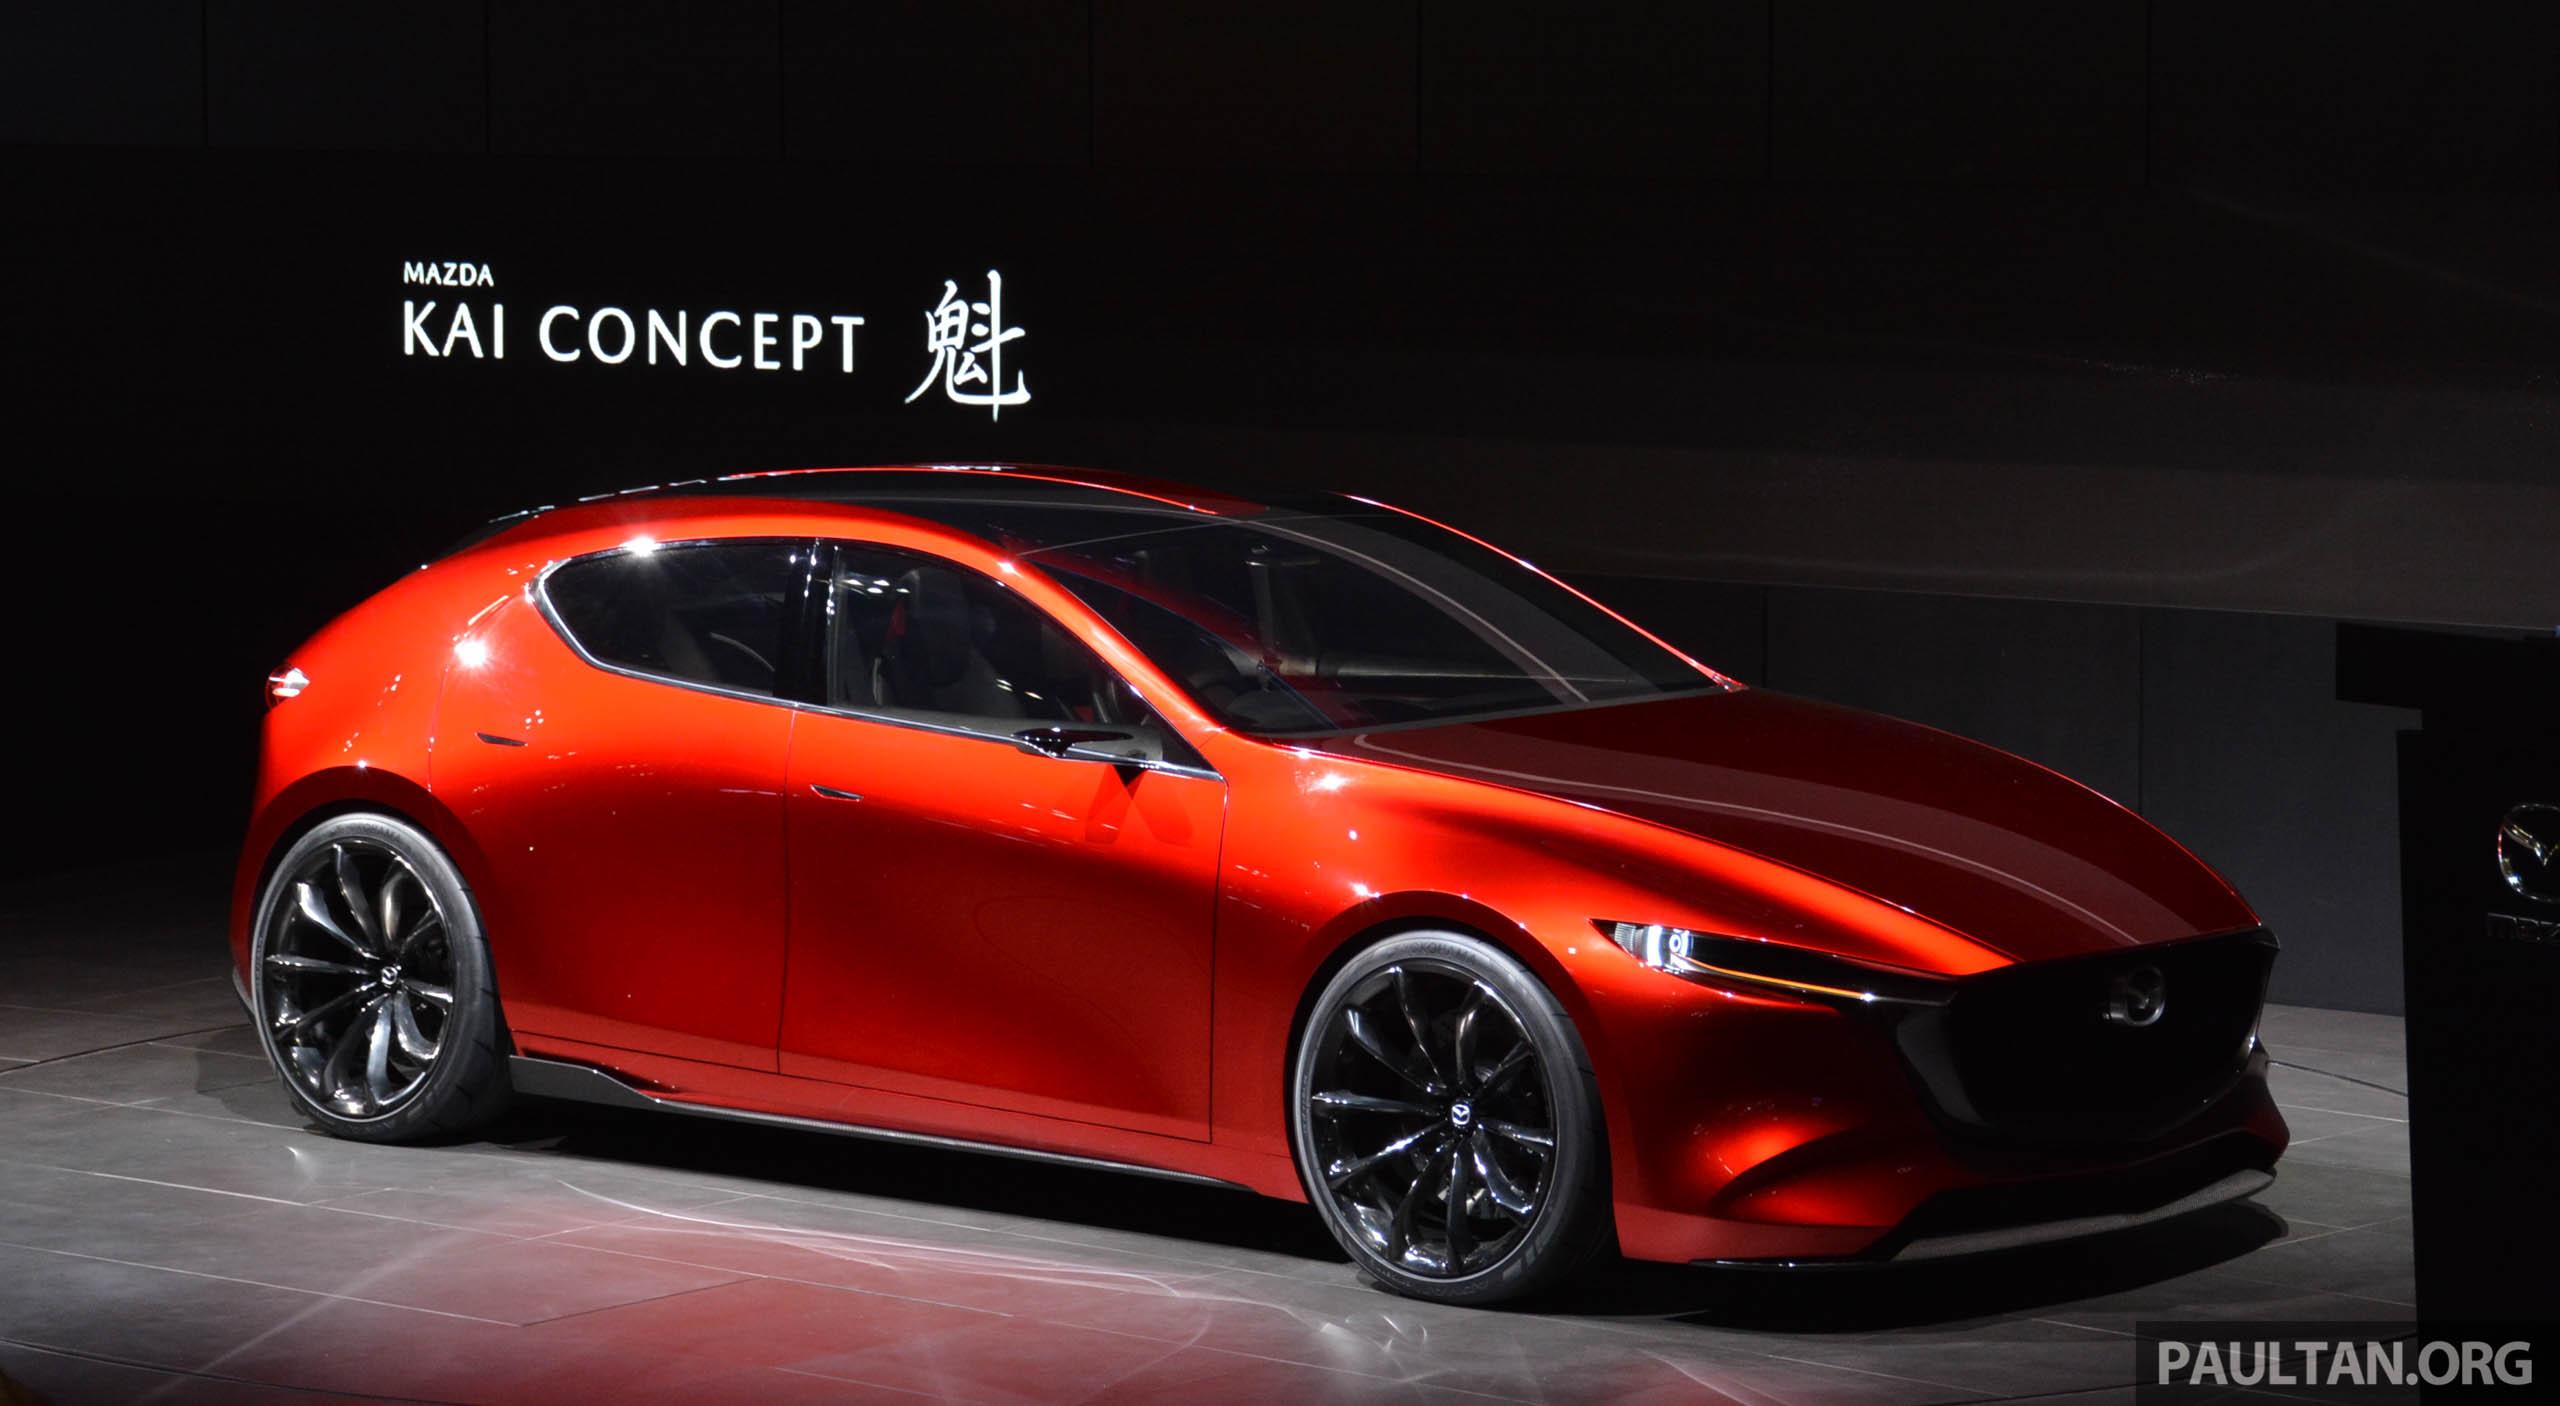 https://s2.paultan.org/image/2017/10/Mazda-Kai-Concept-TMS2017-15.jpg